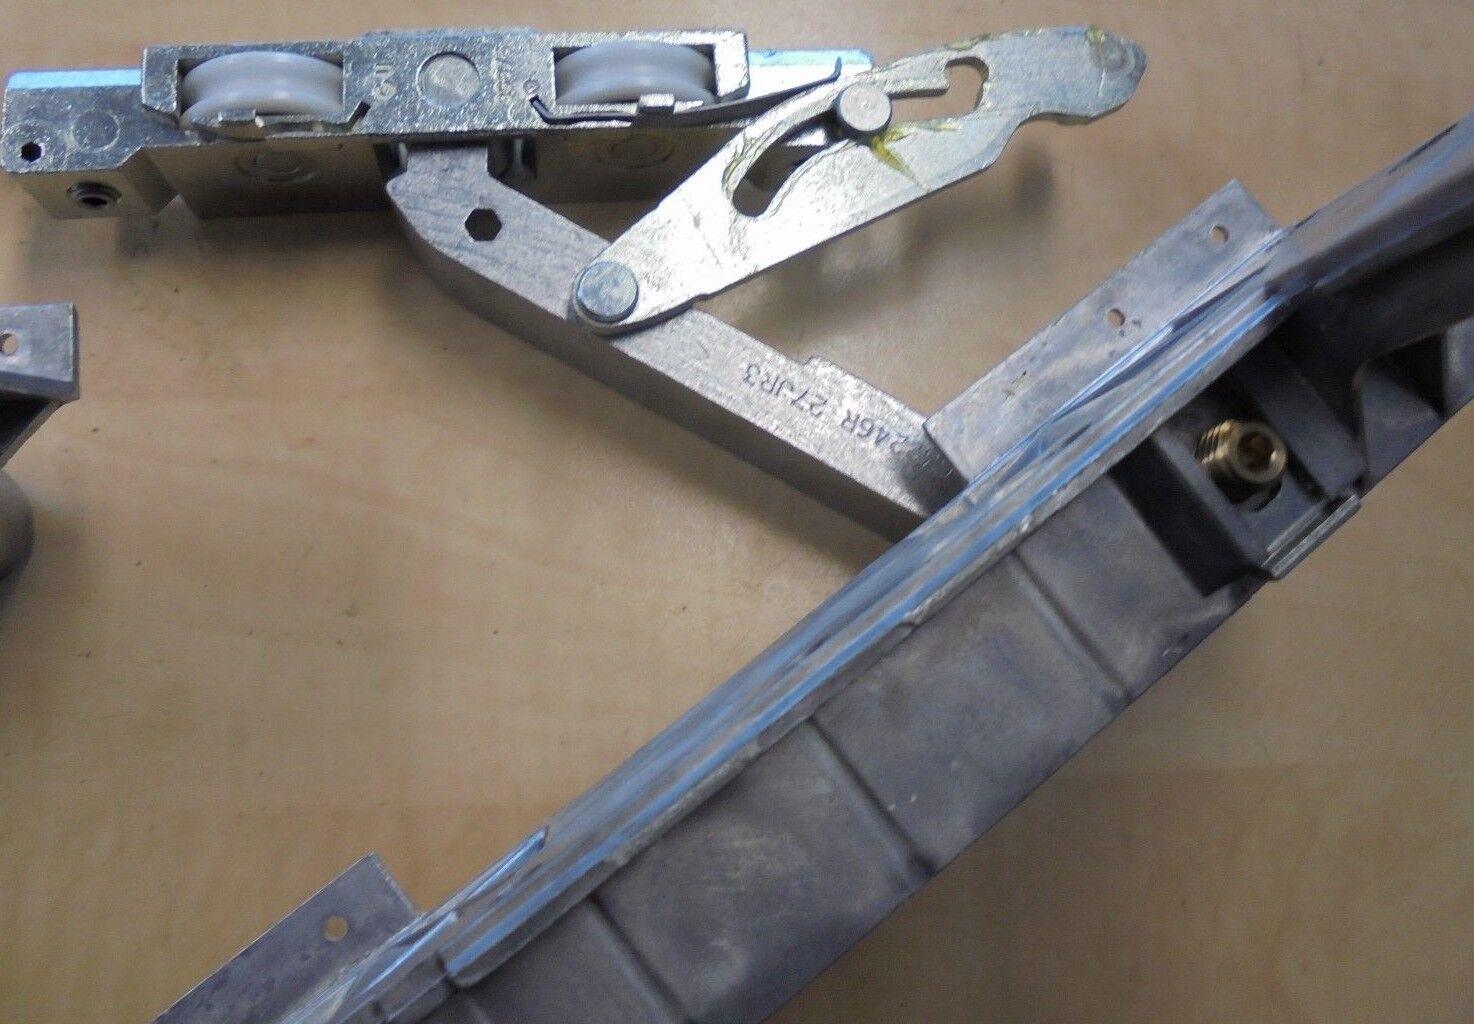 GU PSK Reparaturlaufwagensatz   966  200 200 200   38515  38514 38516 39876   DIN rechts | Hochwertig  b74875